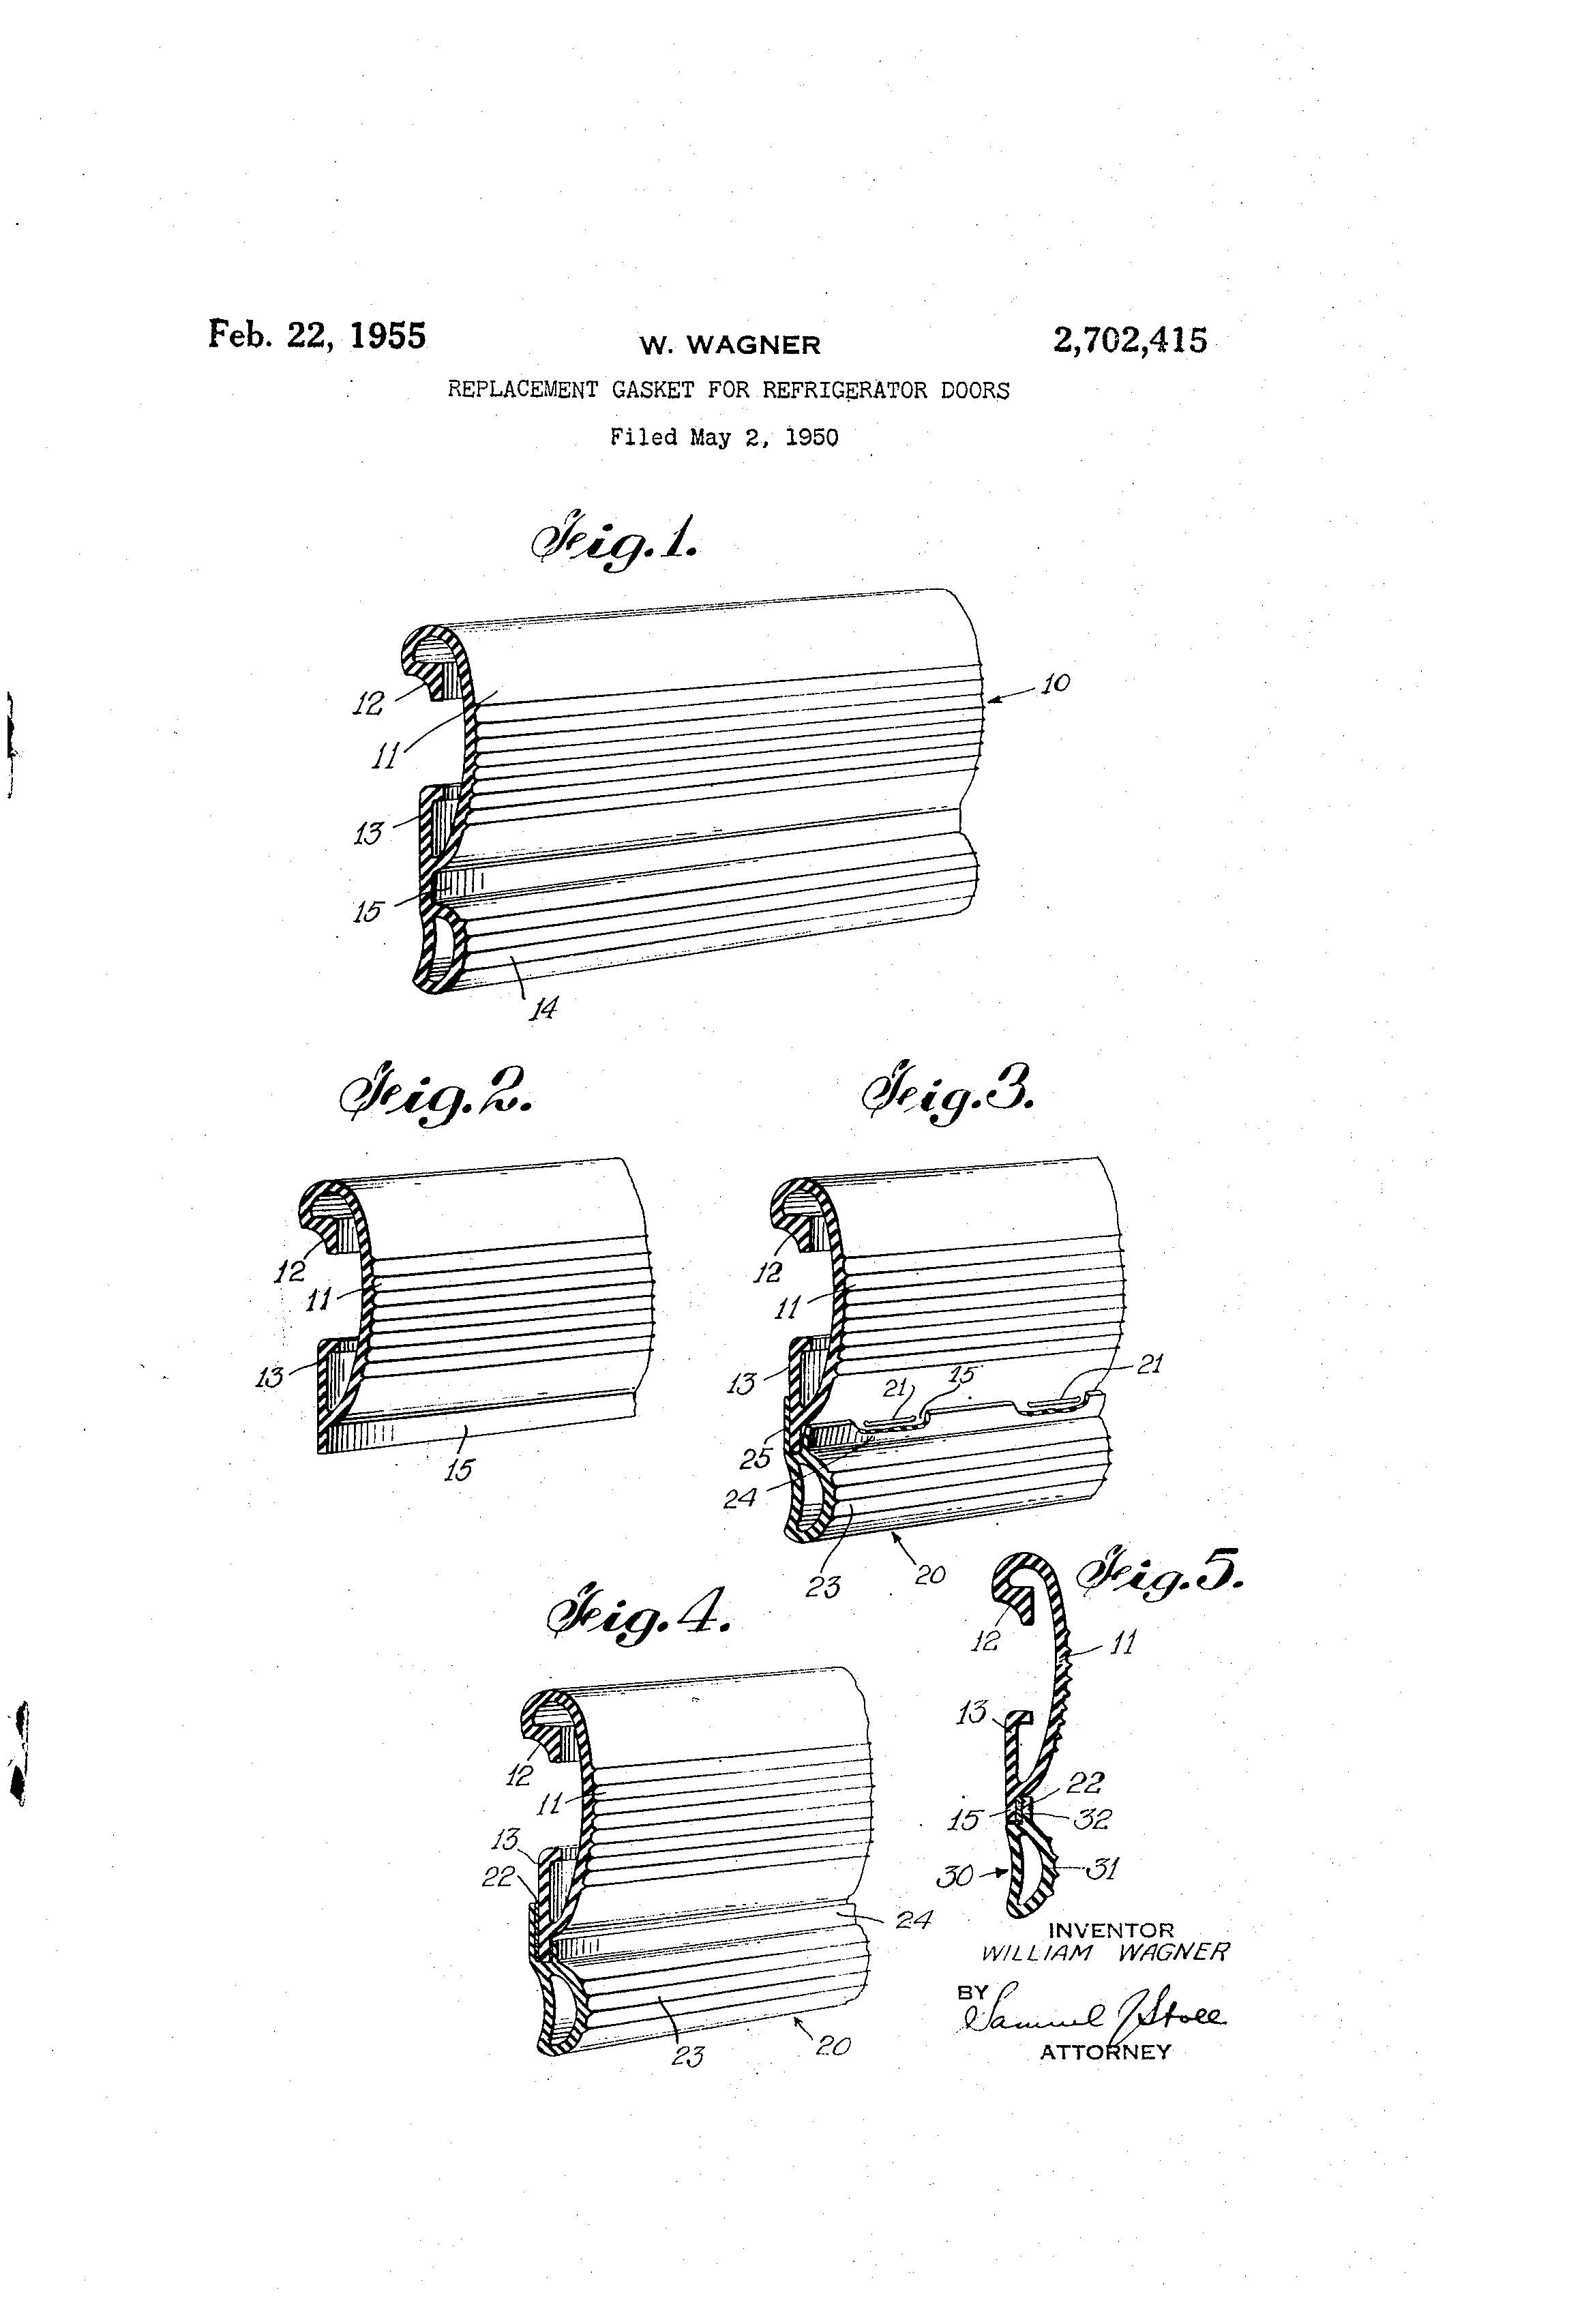 Replace refrigerator door seal - Patent Drawing